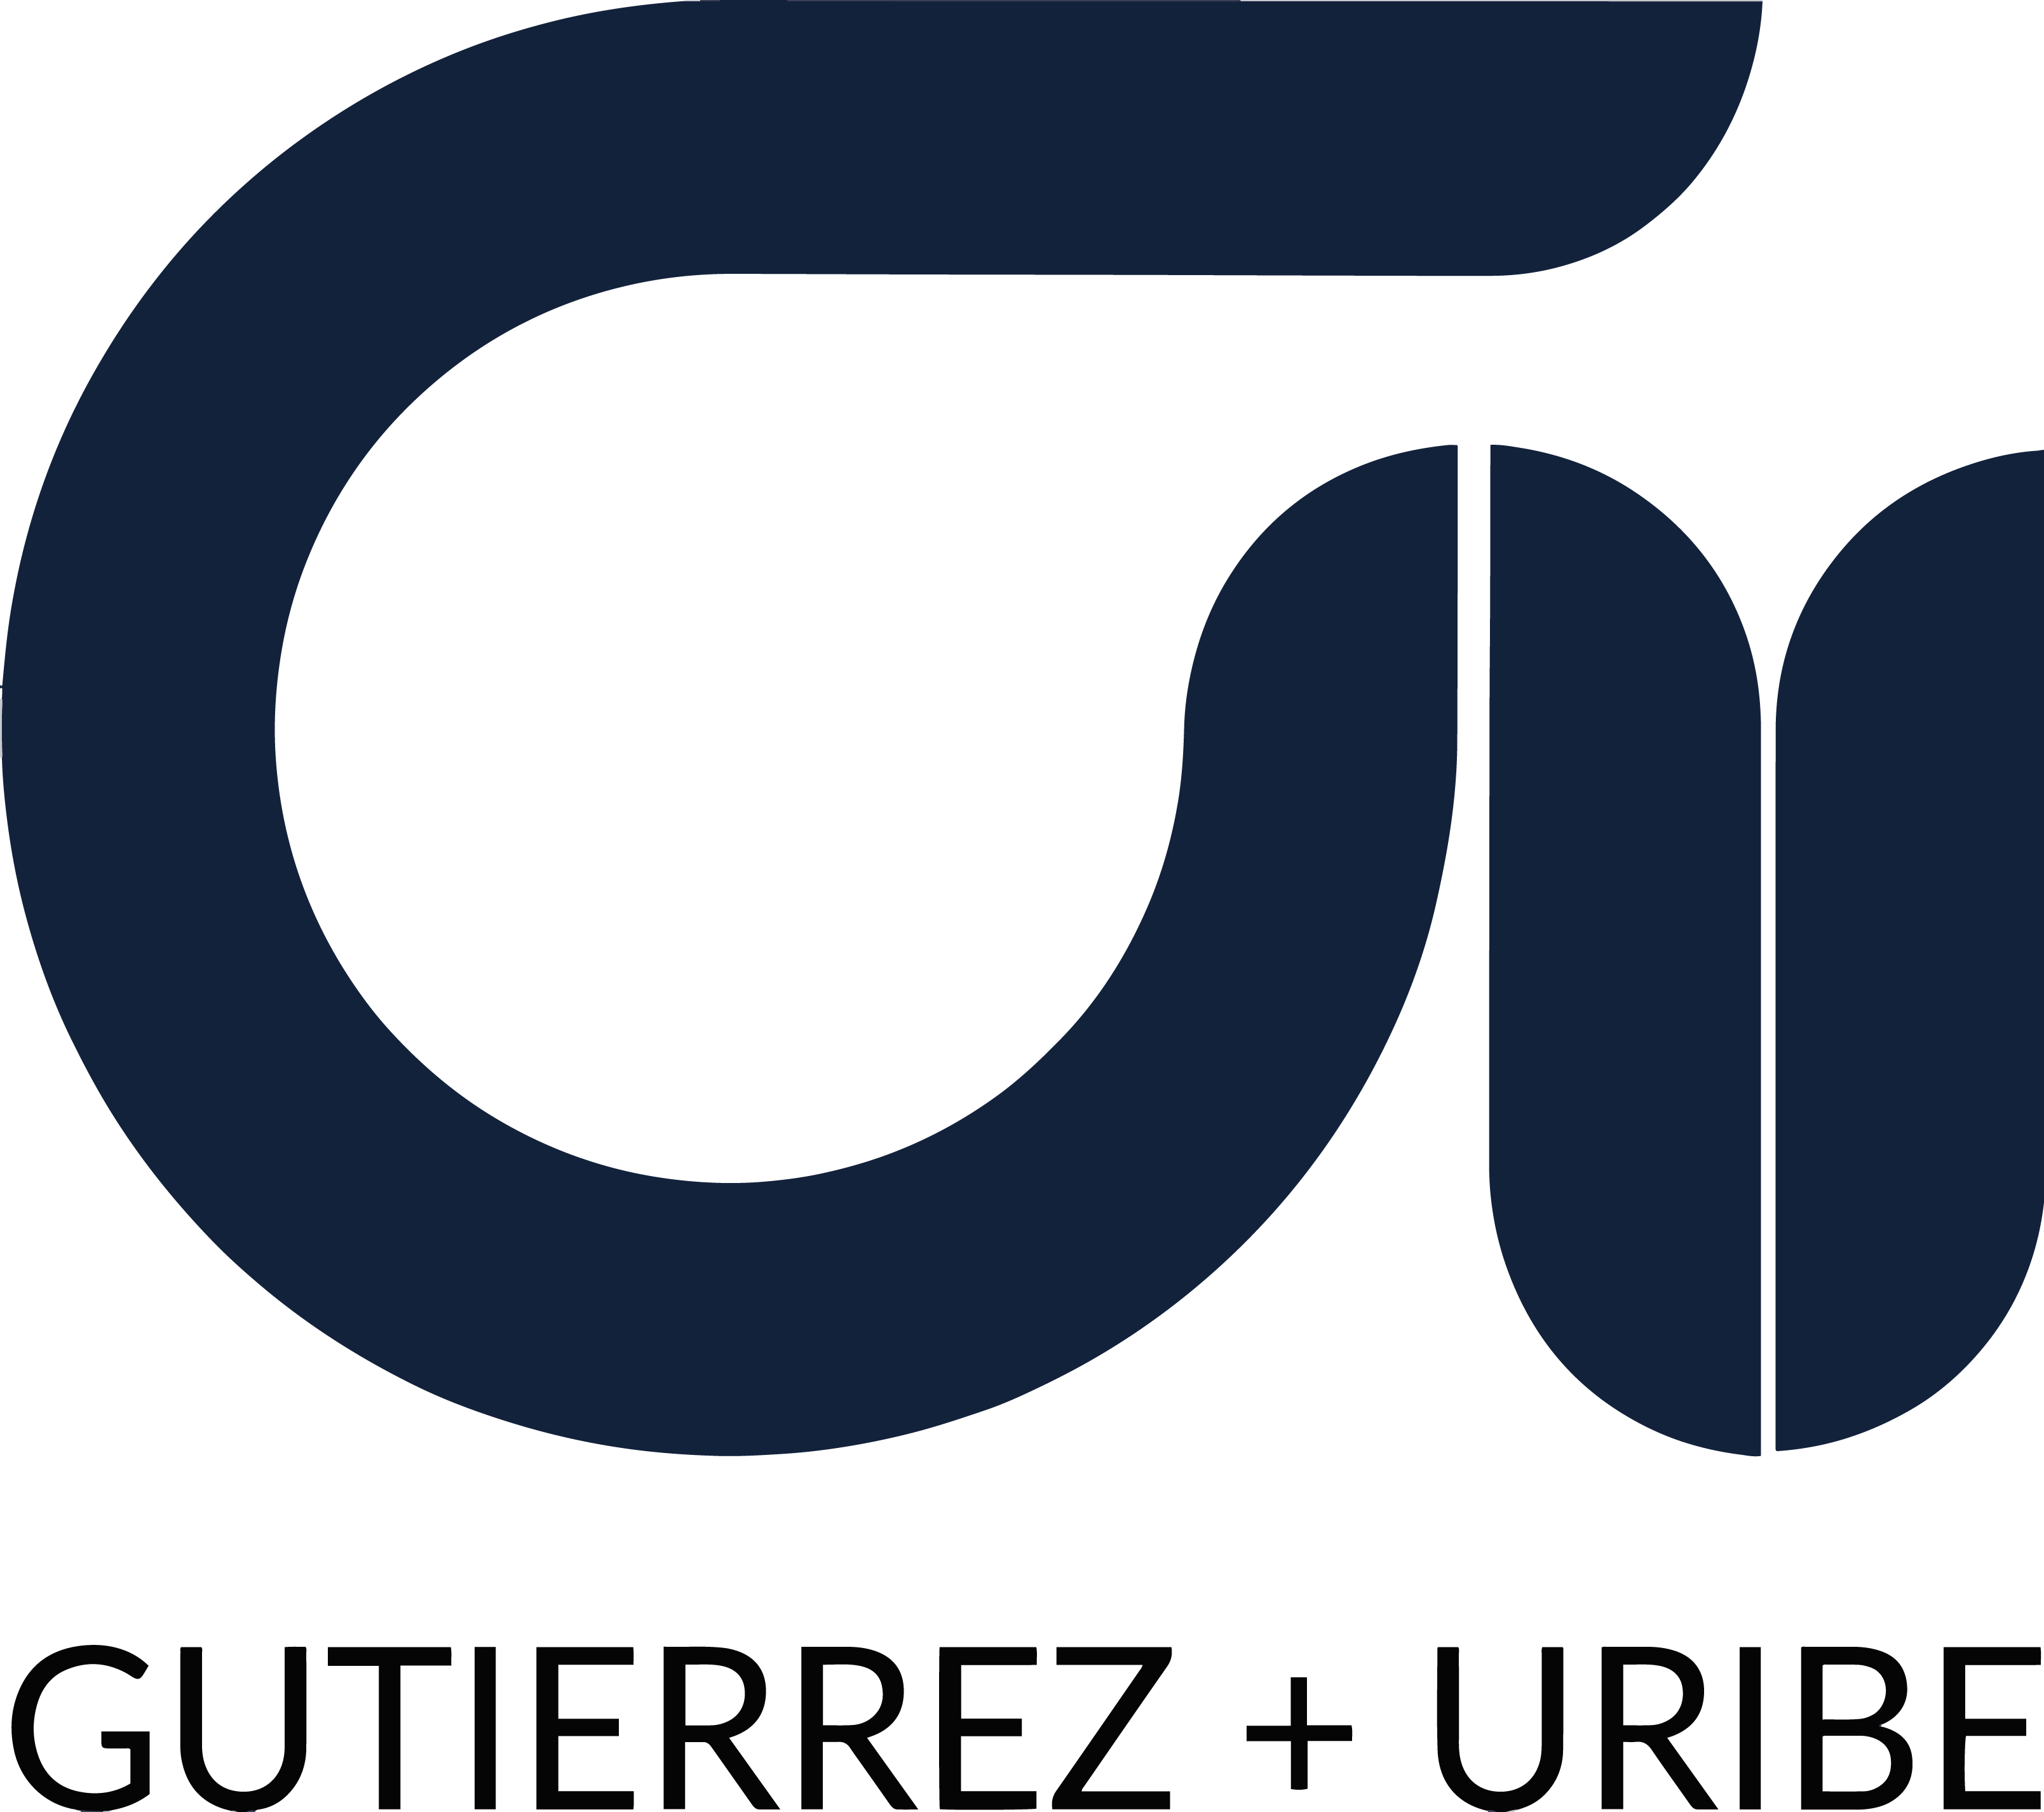 Imelda Gutierrez